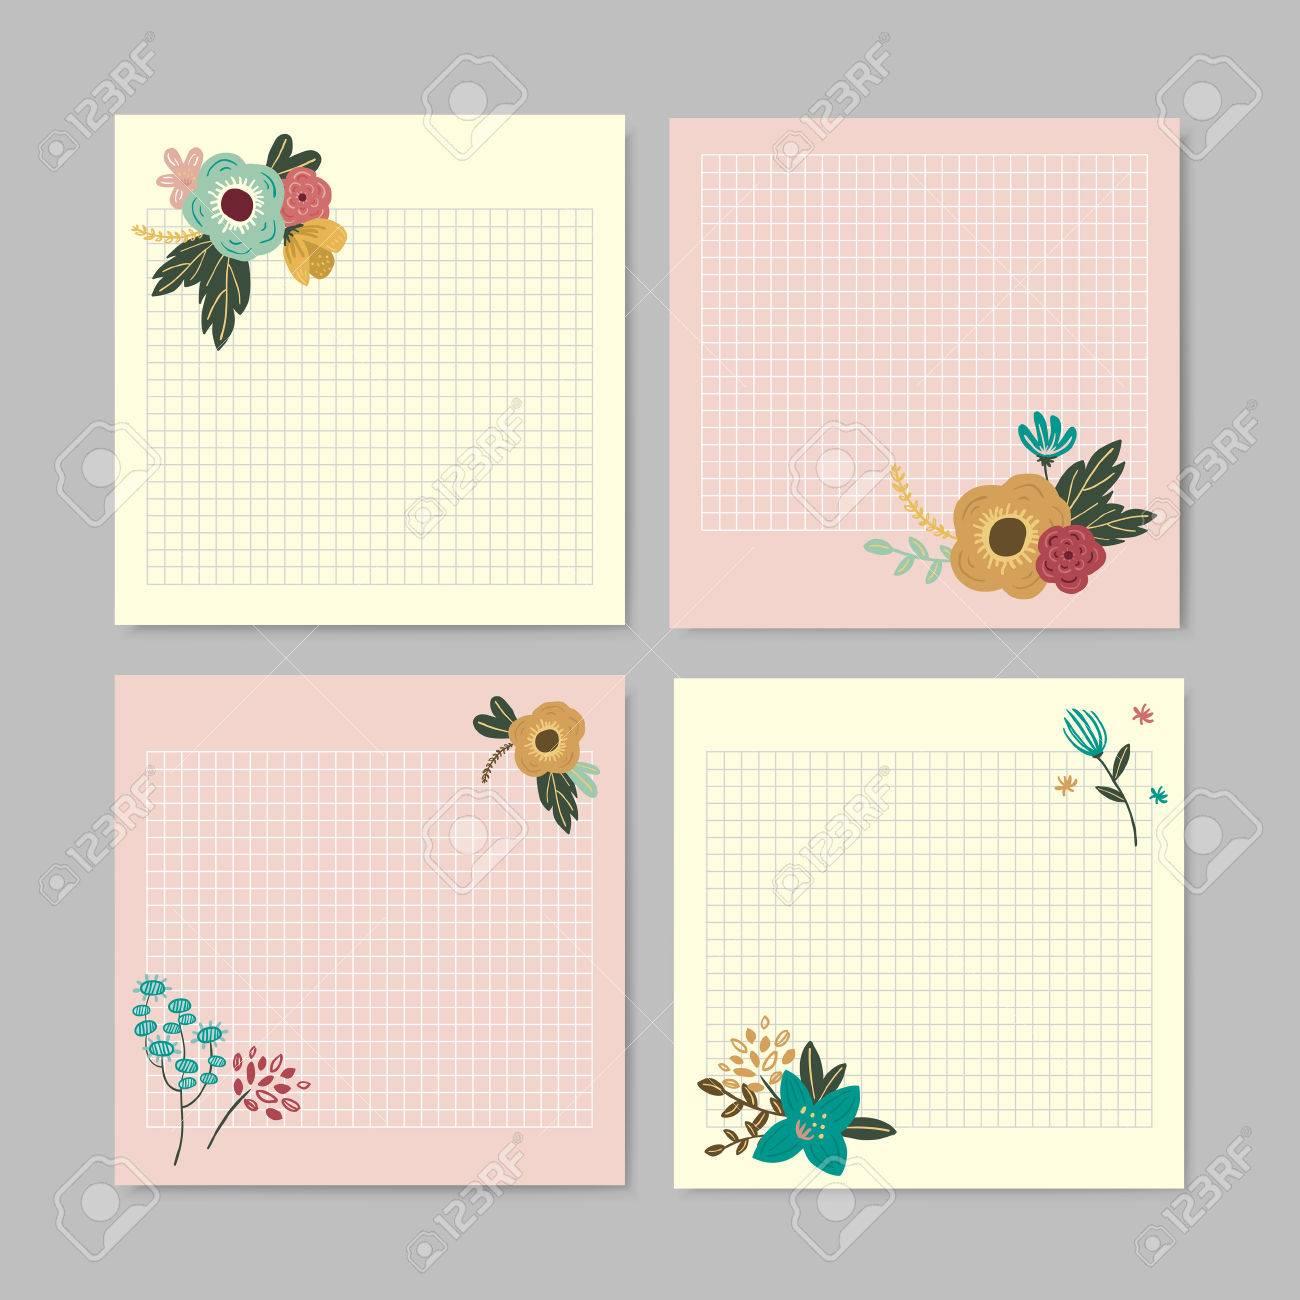 adorable hand drawn style floral memo design set royalty vector adorable hand drawn style floral memo design set